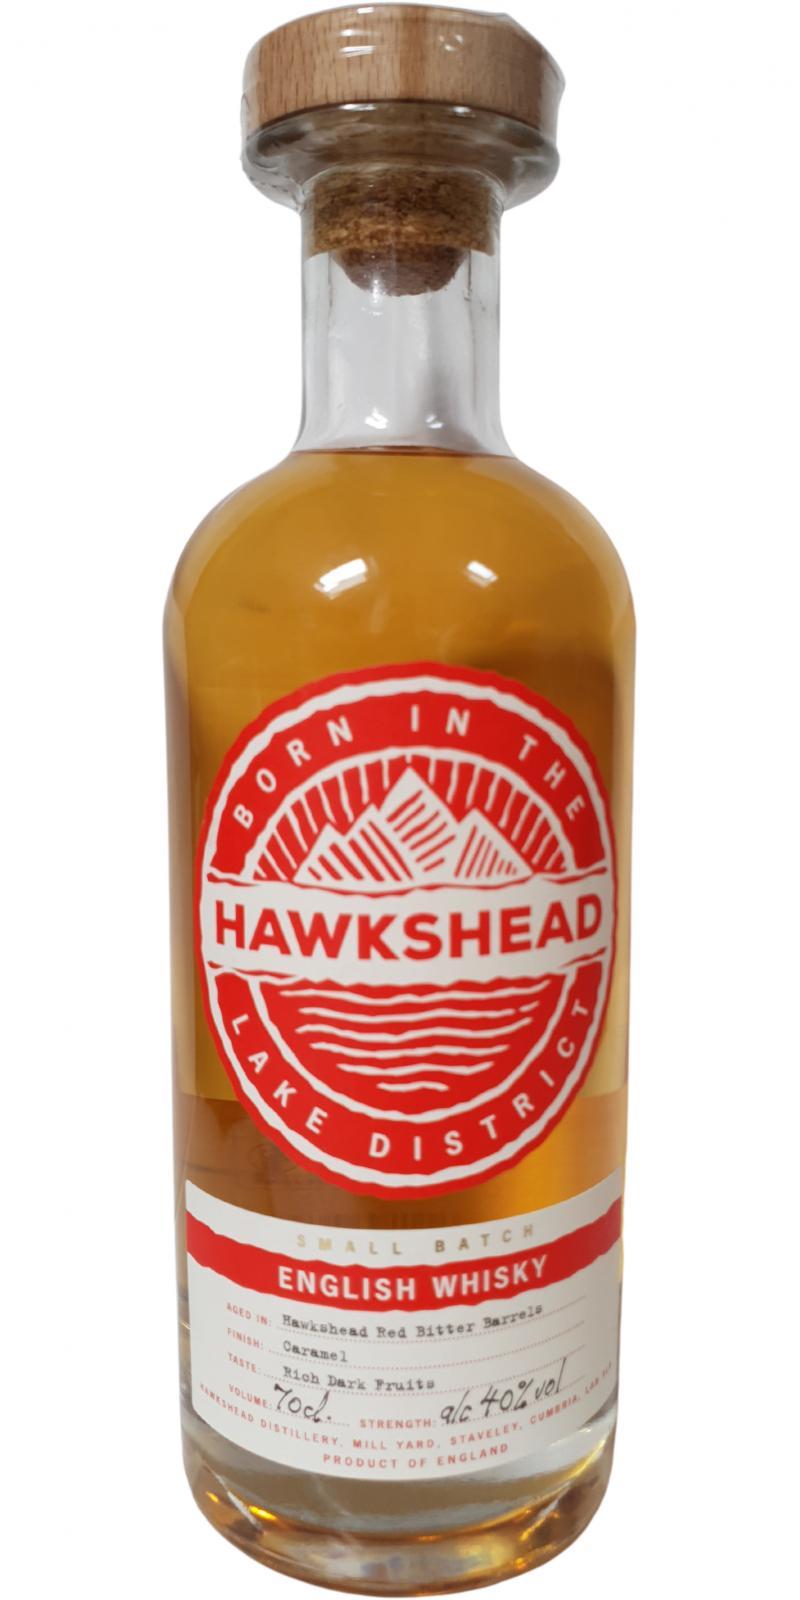 Hawkshead Small Batch